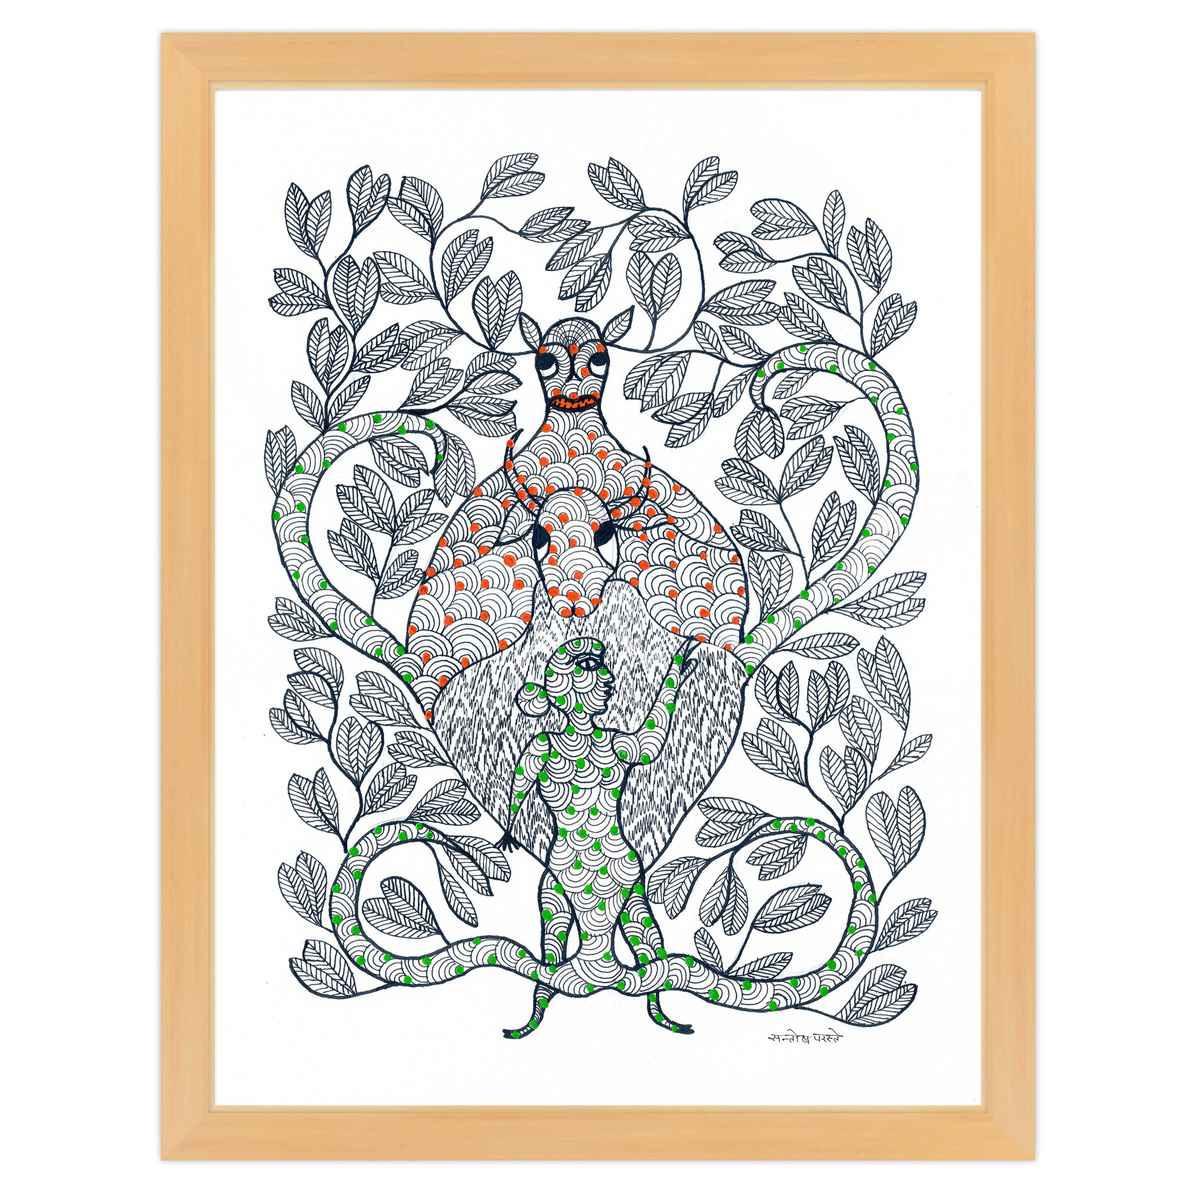 Santosh coloring #2, Download drawings